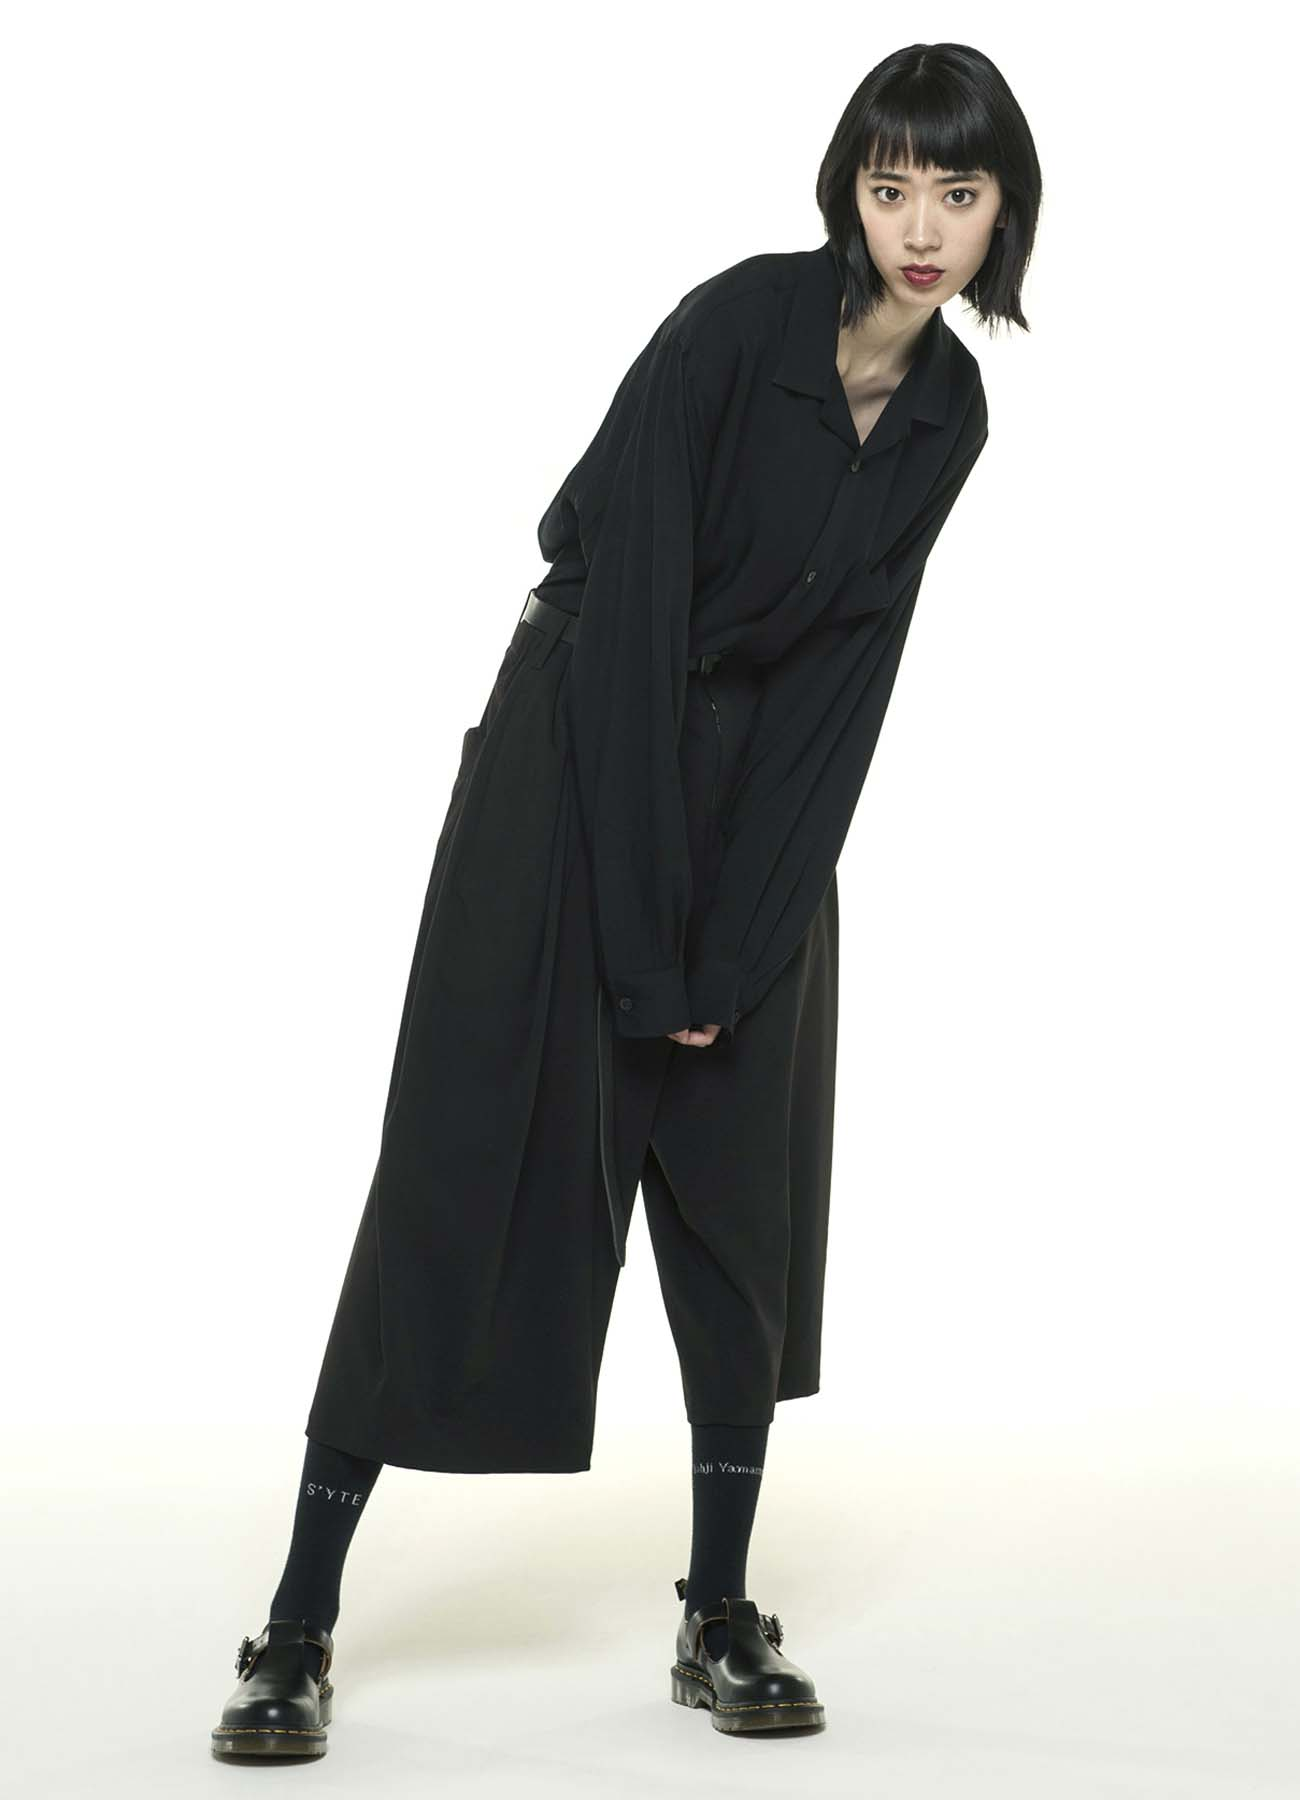 Pe/Rayon Gabardine Stretch One Tack 6-quarter-length Pants